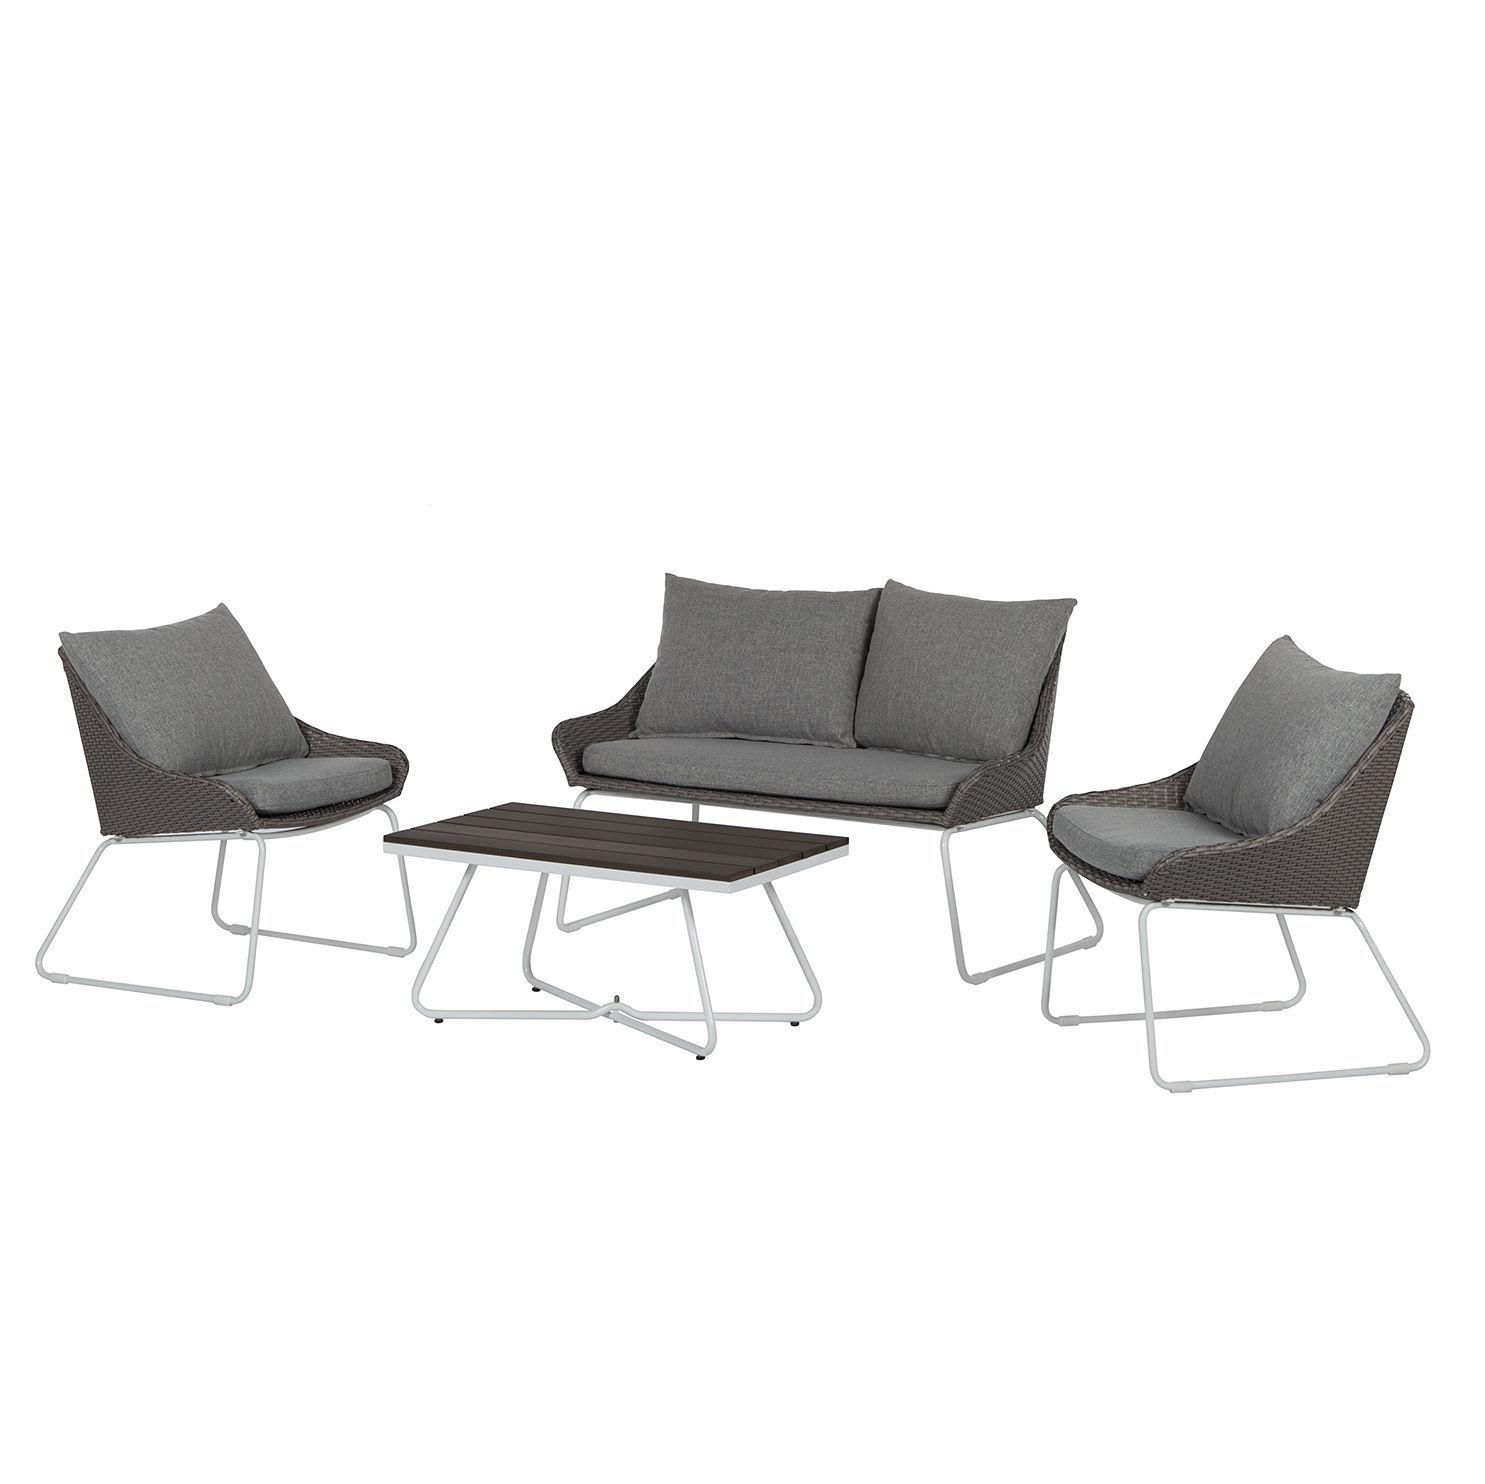 Lounge Set Gran Rey (4 teilig)   Rattan / Stahl   Grau, Fredriks